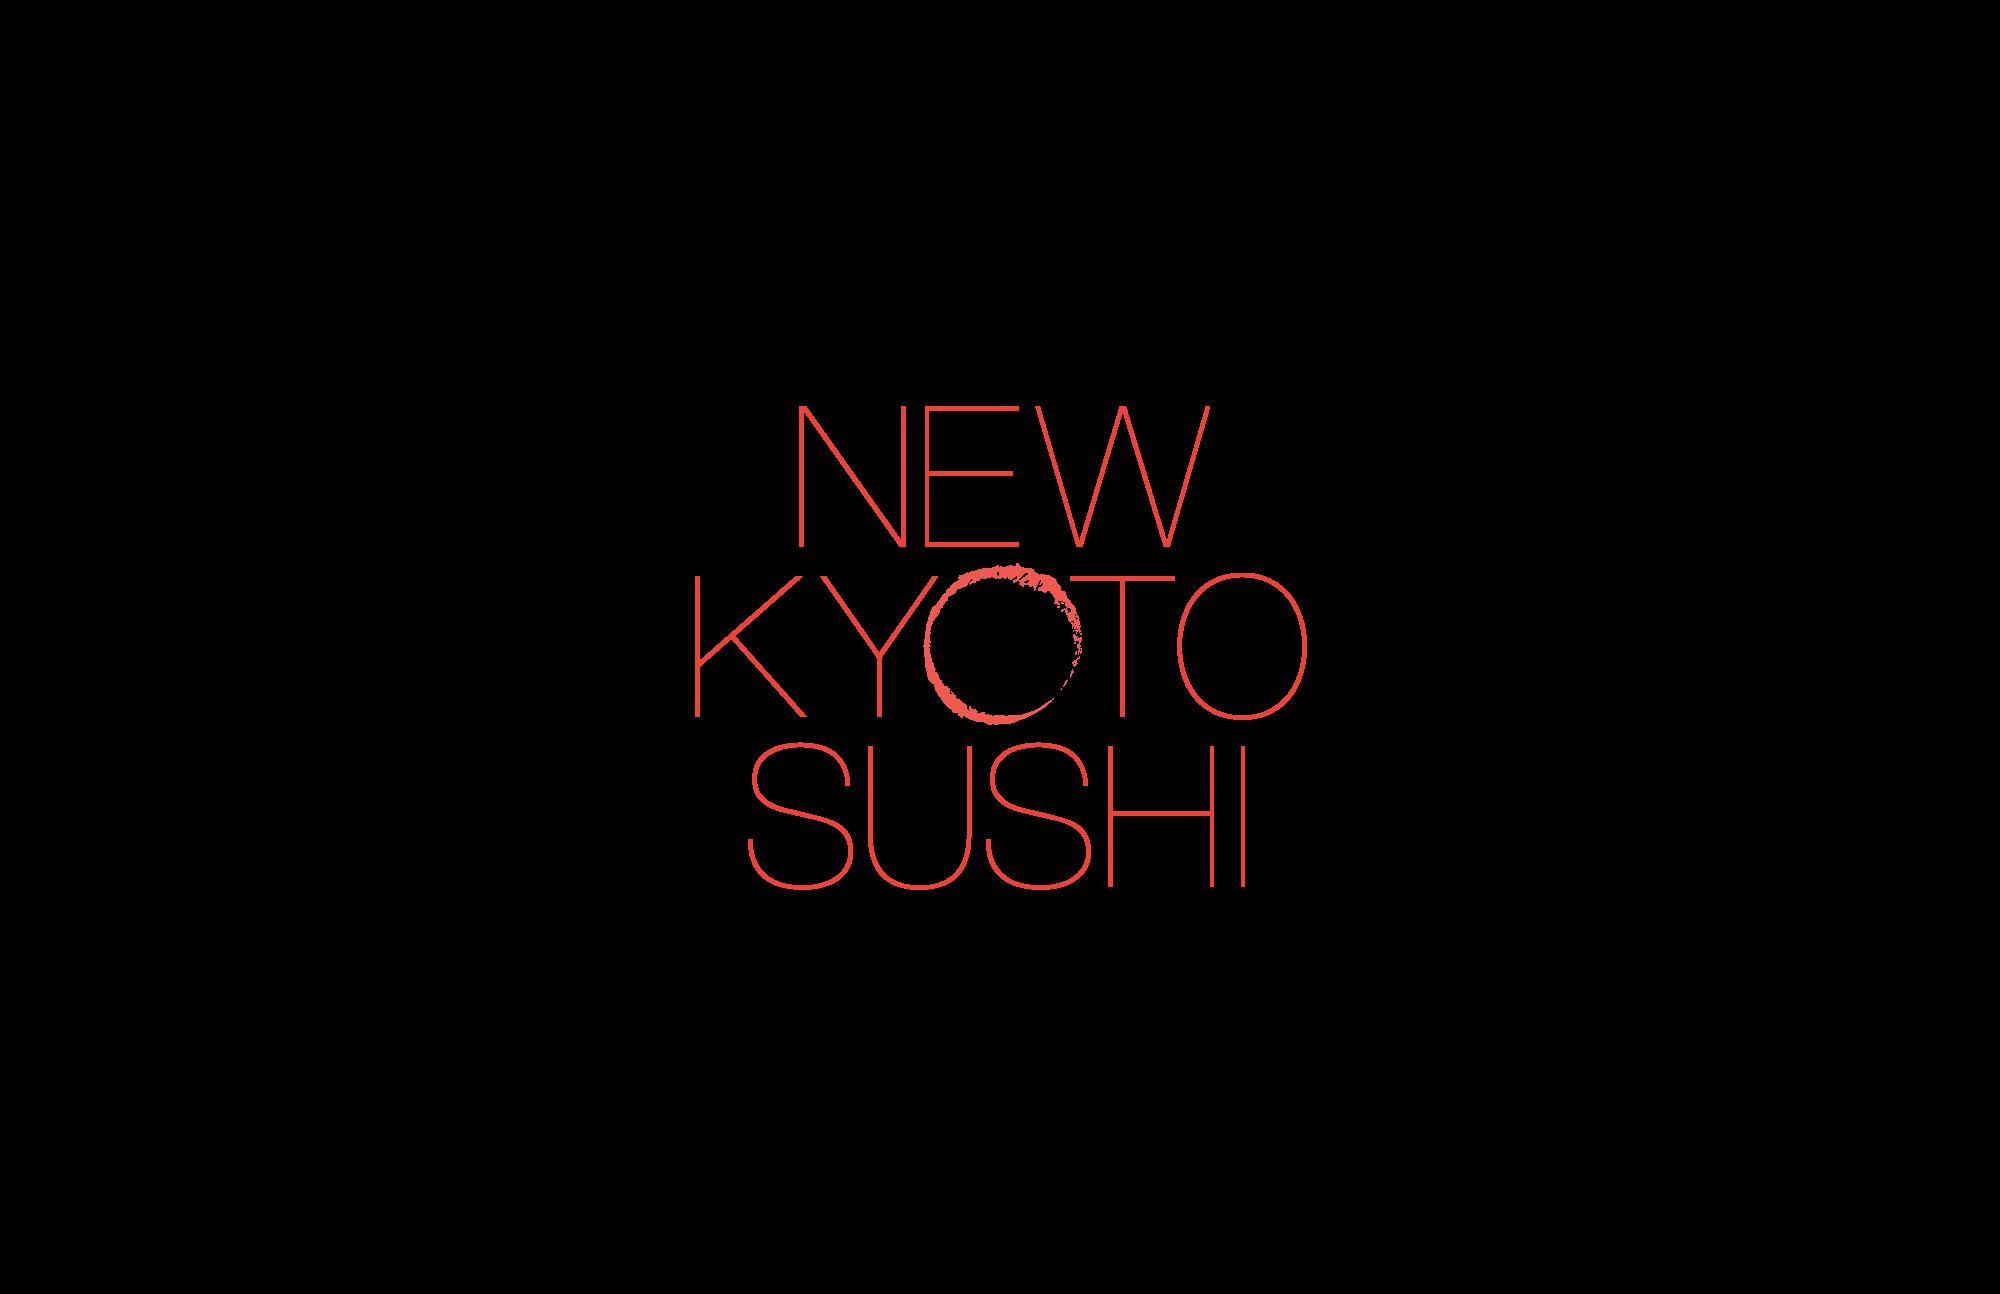 New Kyoto Sushi